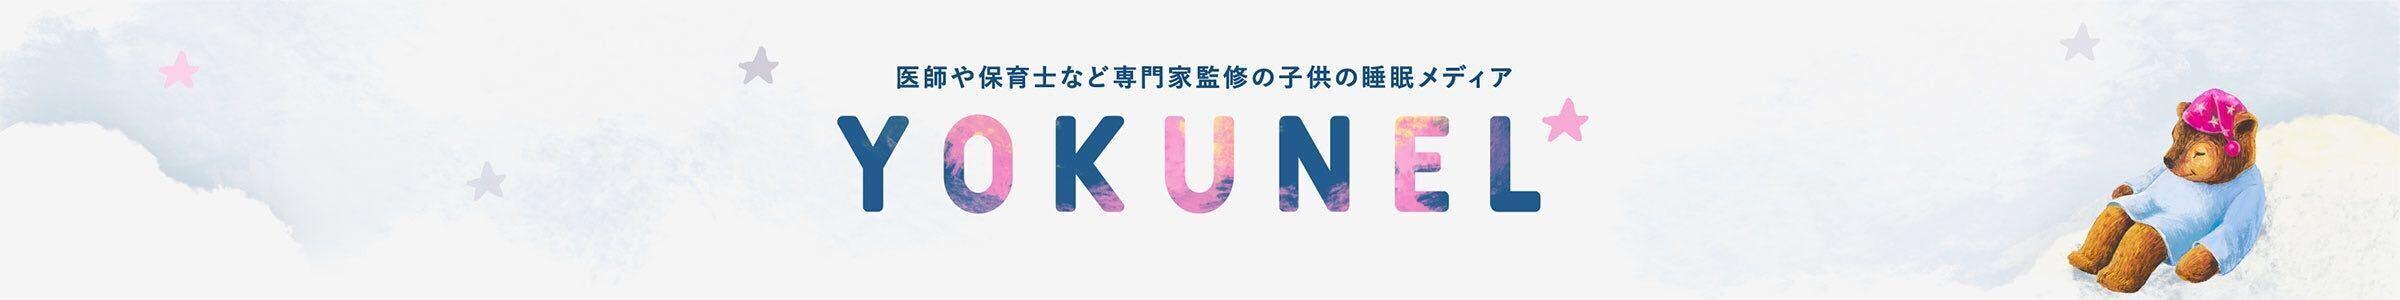 YOKUNEL(ヨクネル)~専門家監修の子ども睡眠メディア~